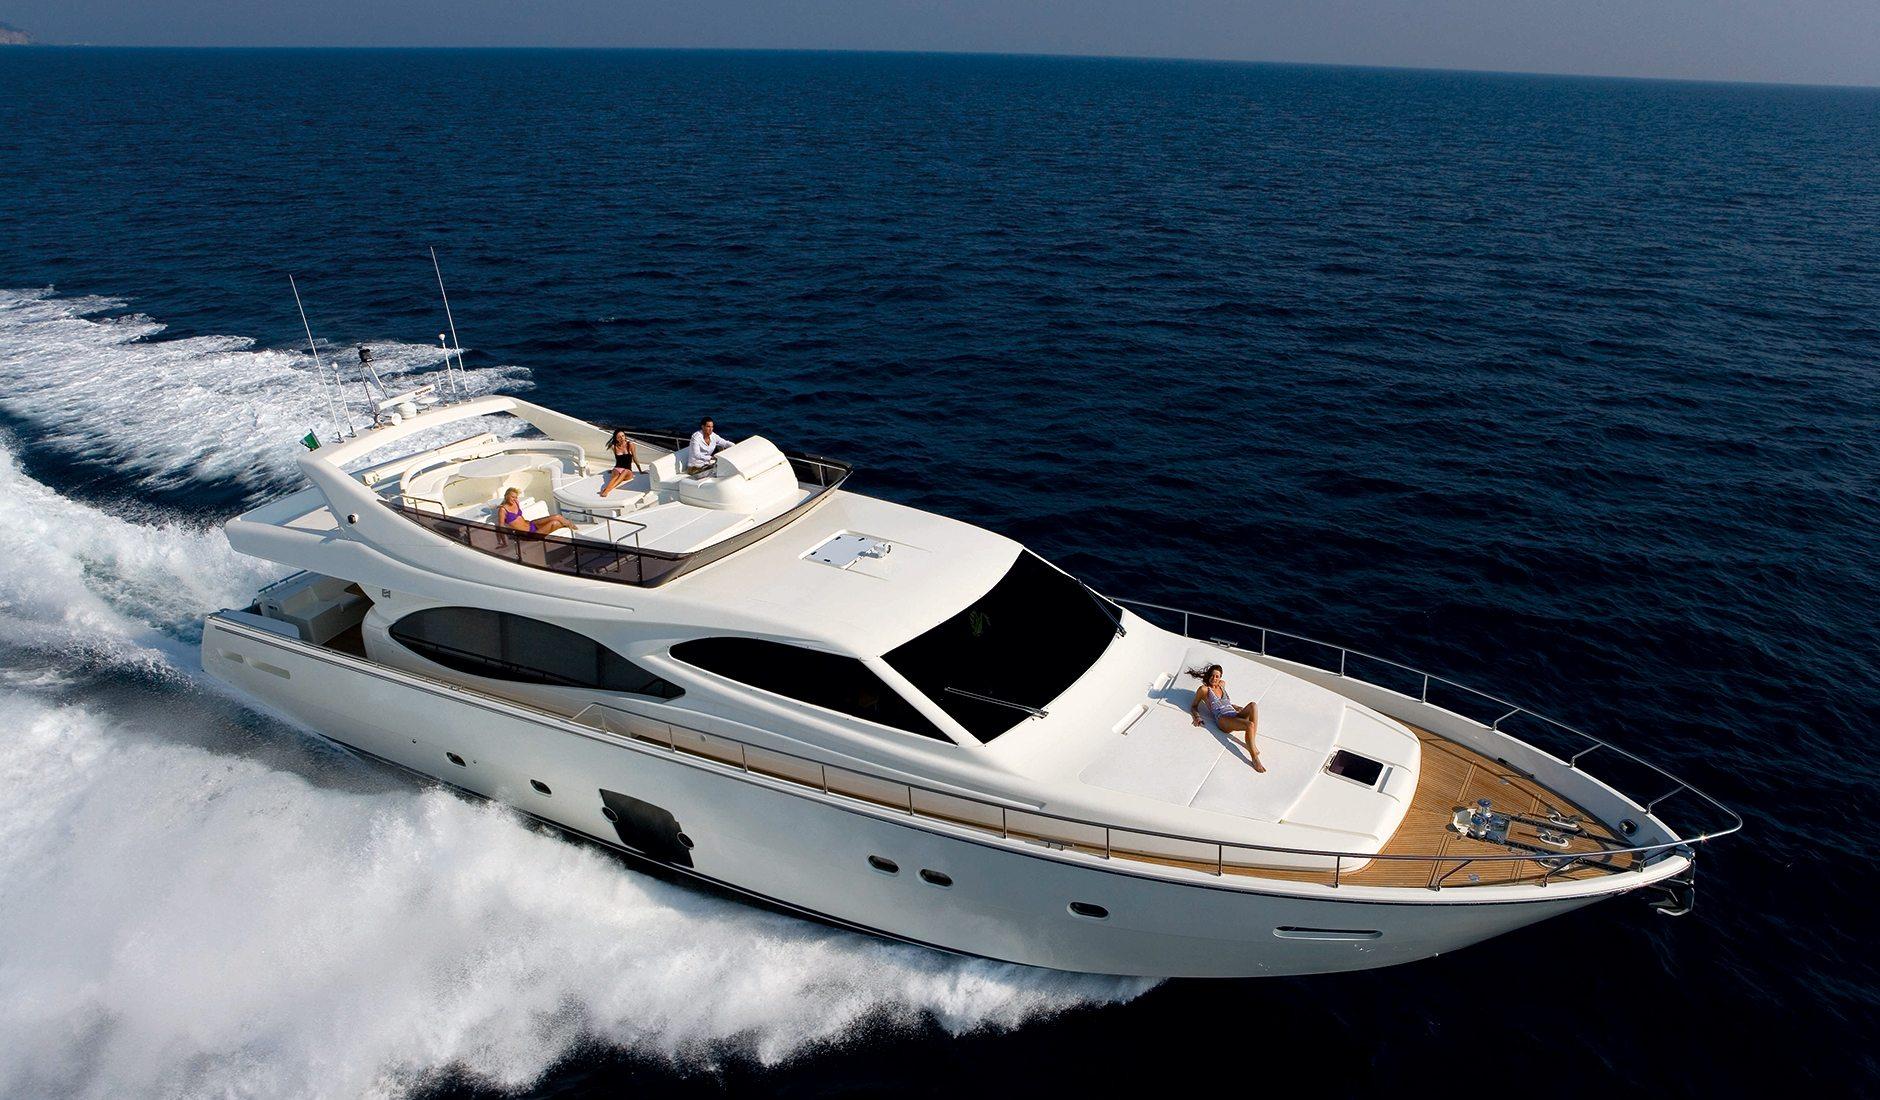 Аренда яхты FERRETTI YACHTS 780 refit 2015 год